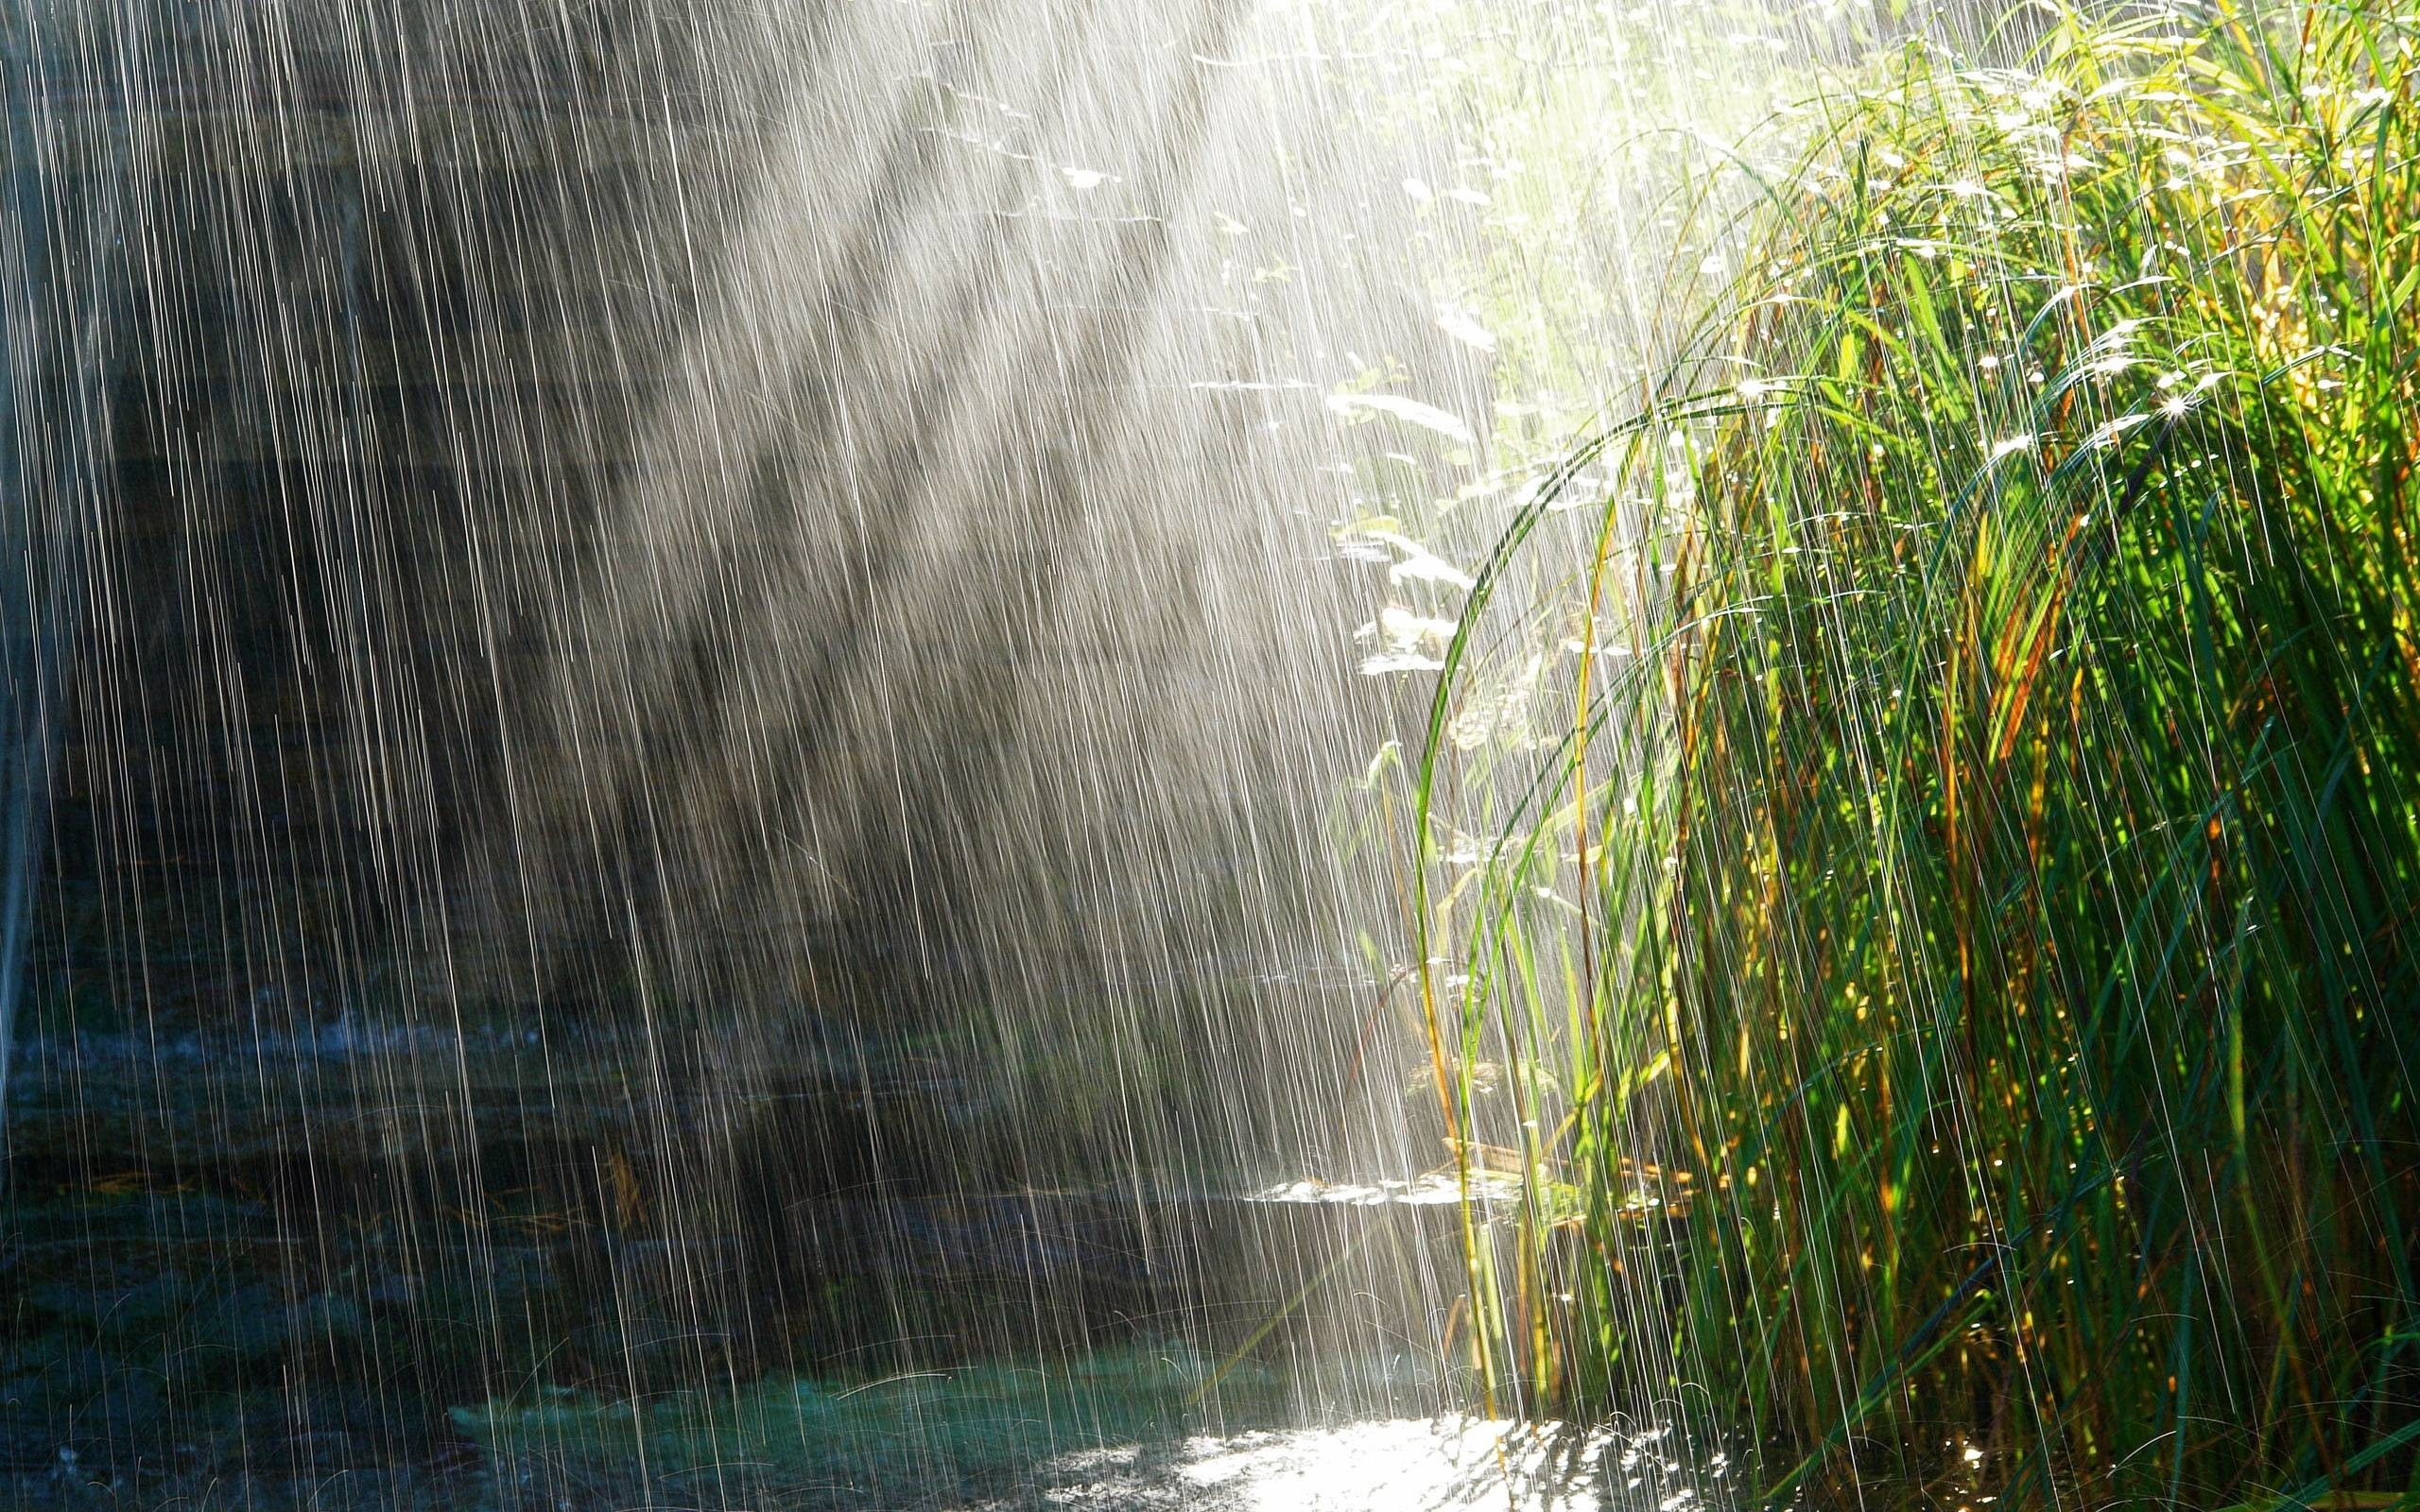 Rainy Day Plant HD Wallpaper